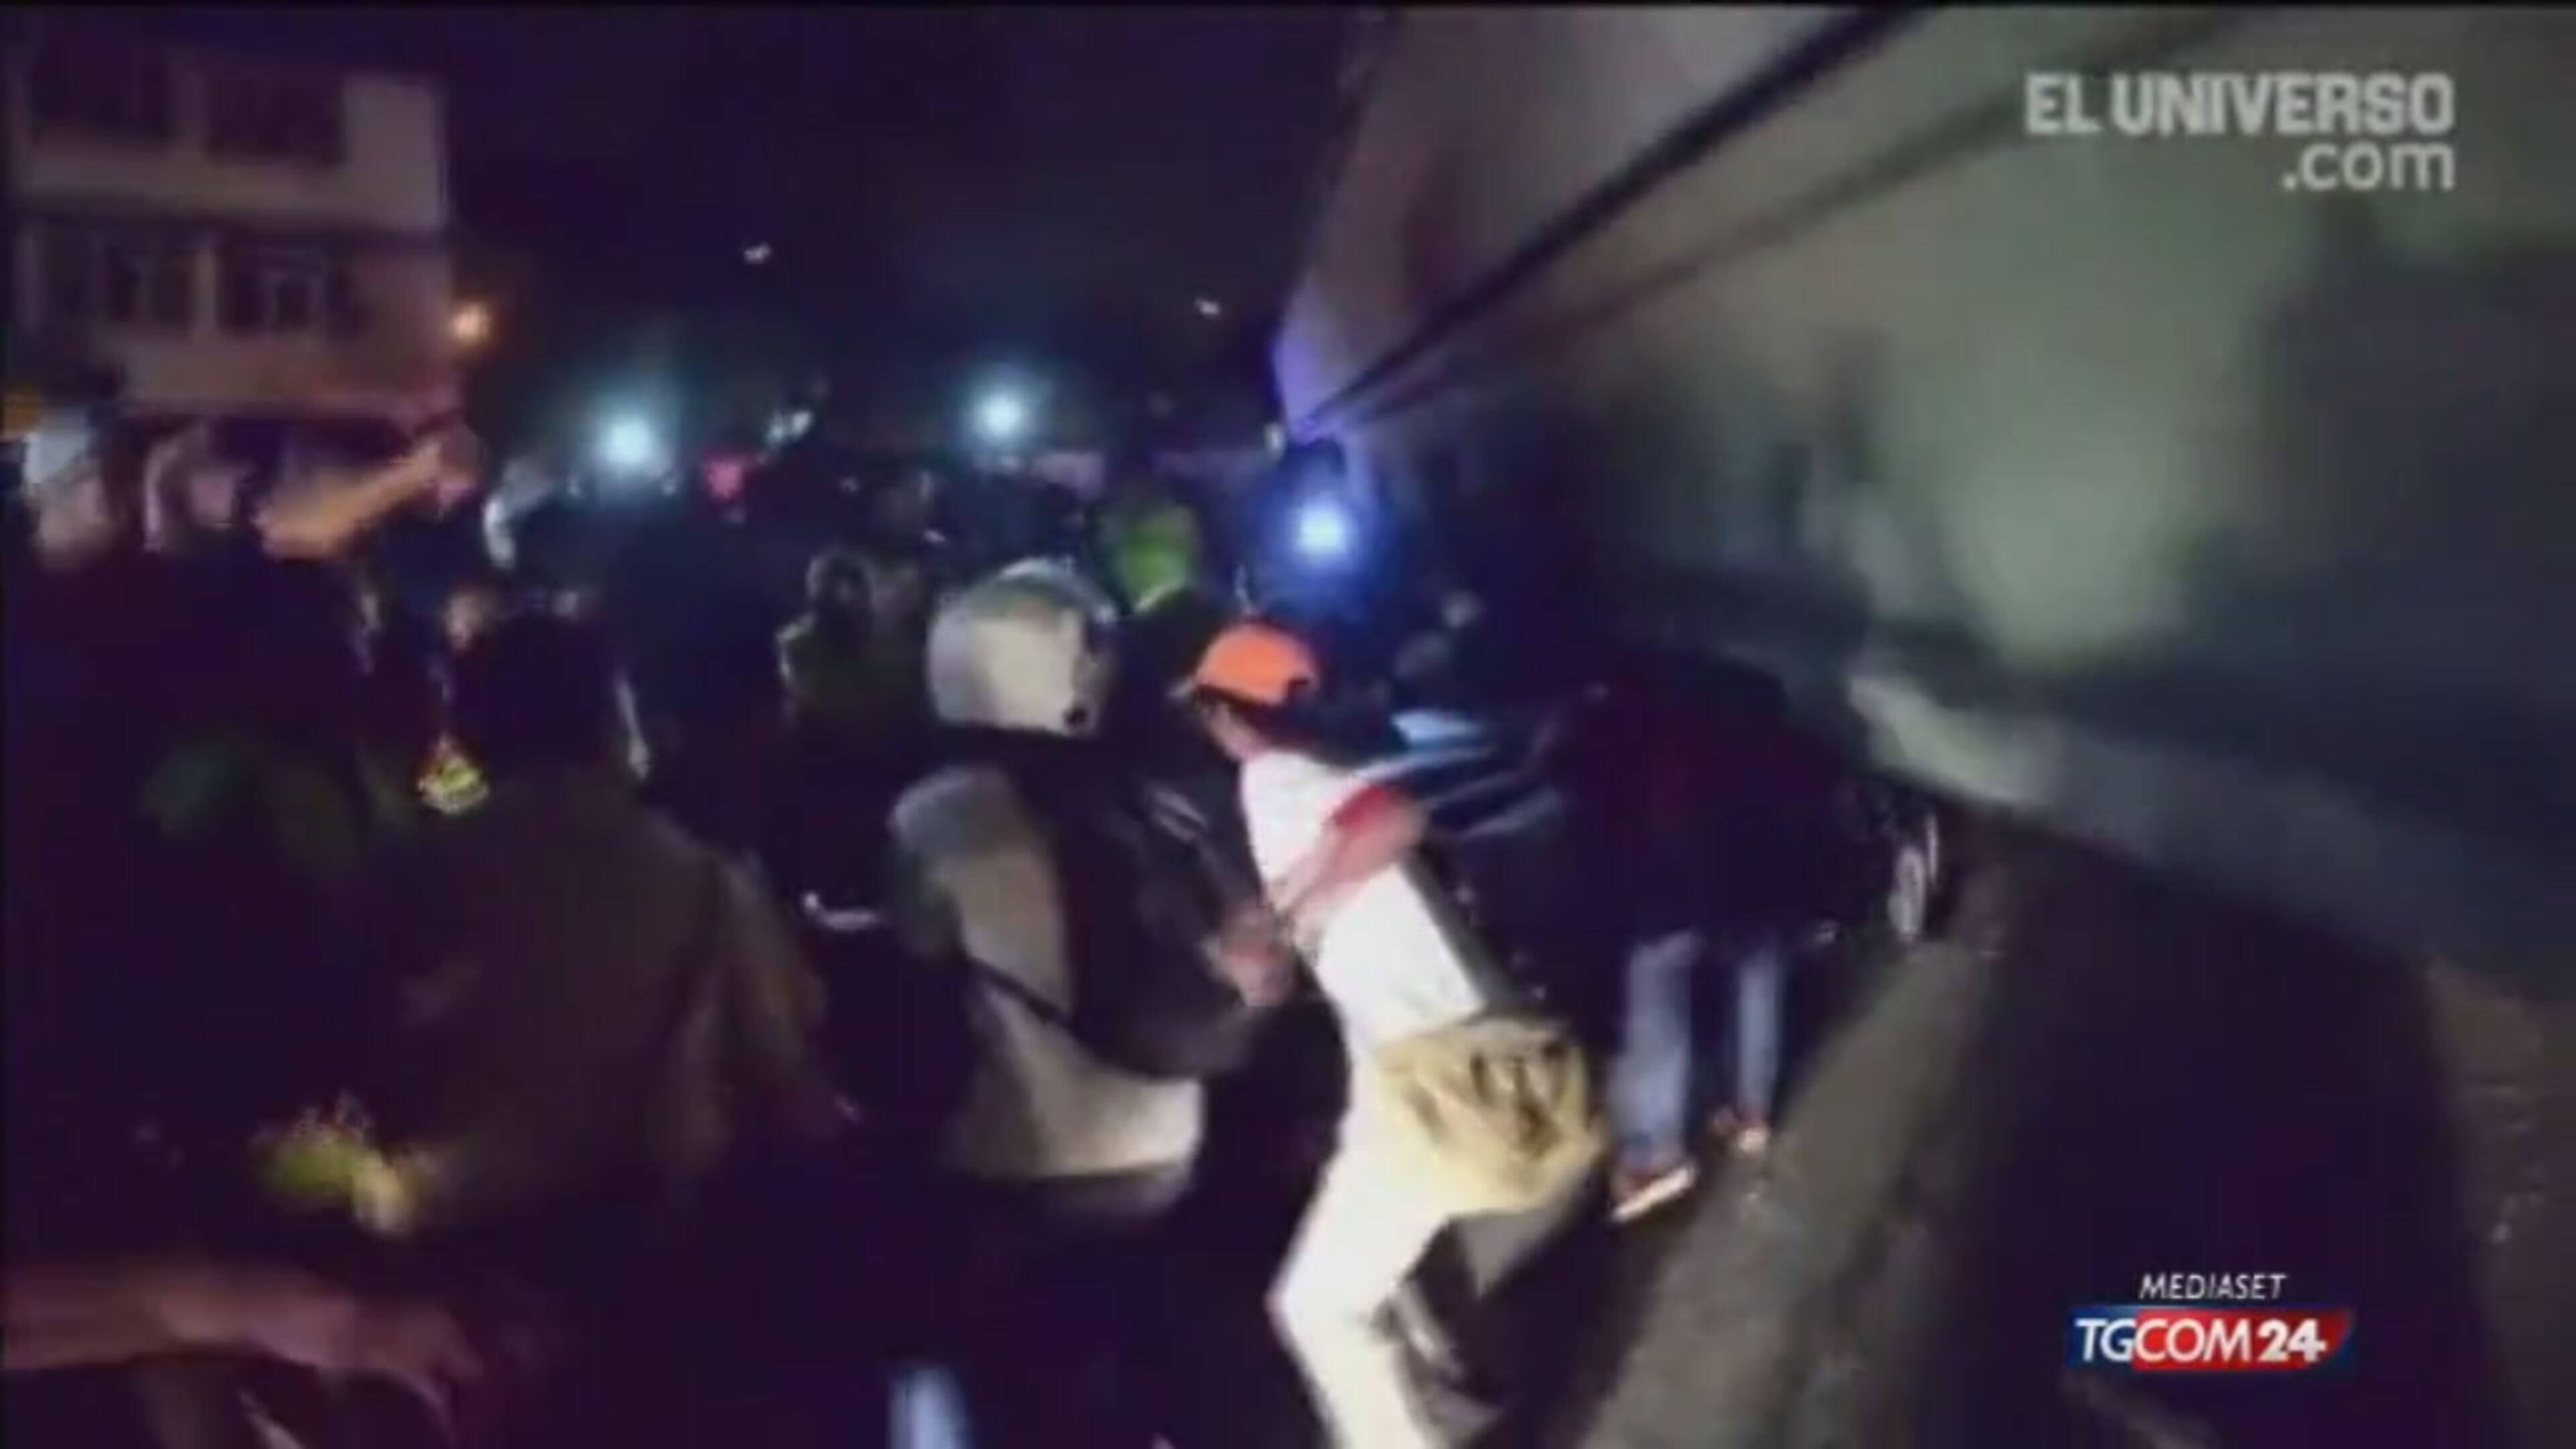 Ecuador, sisma di magnitudo 7,8 devasta la costa